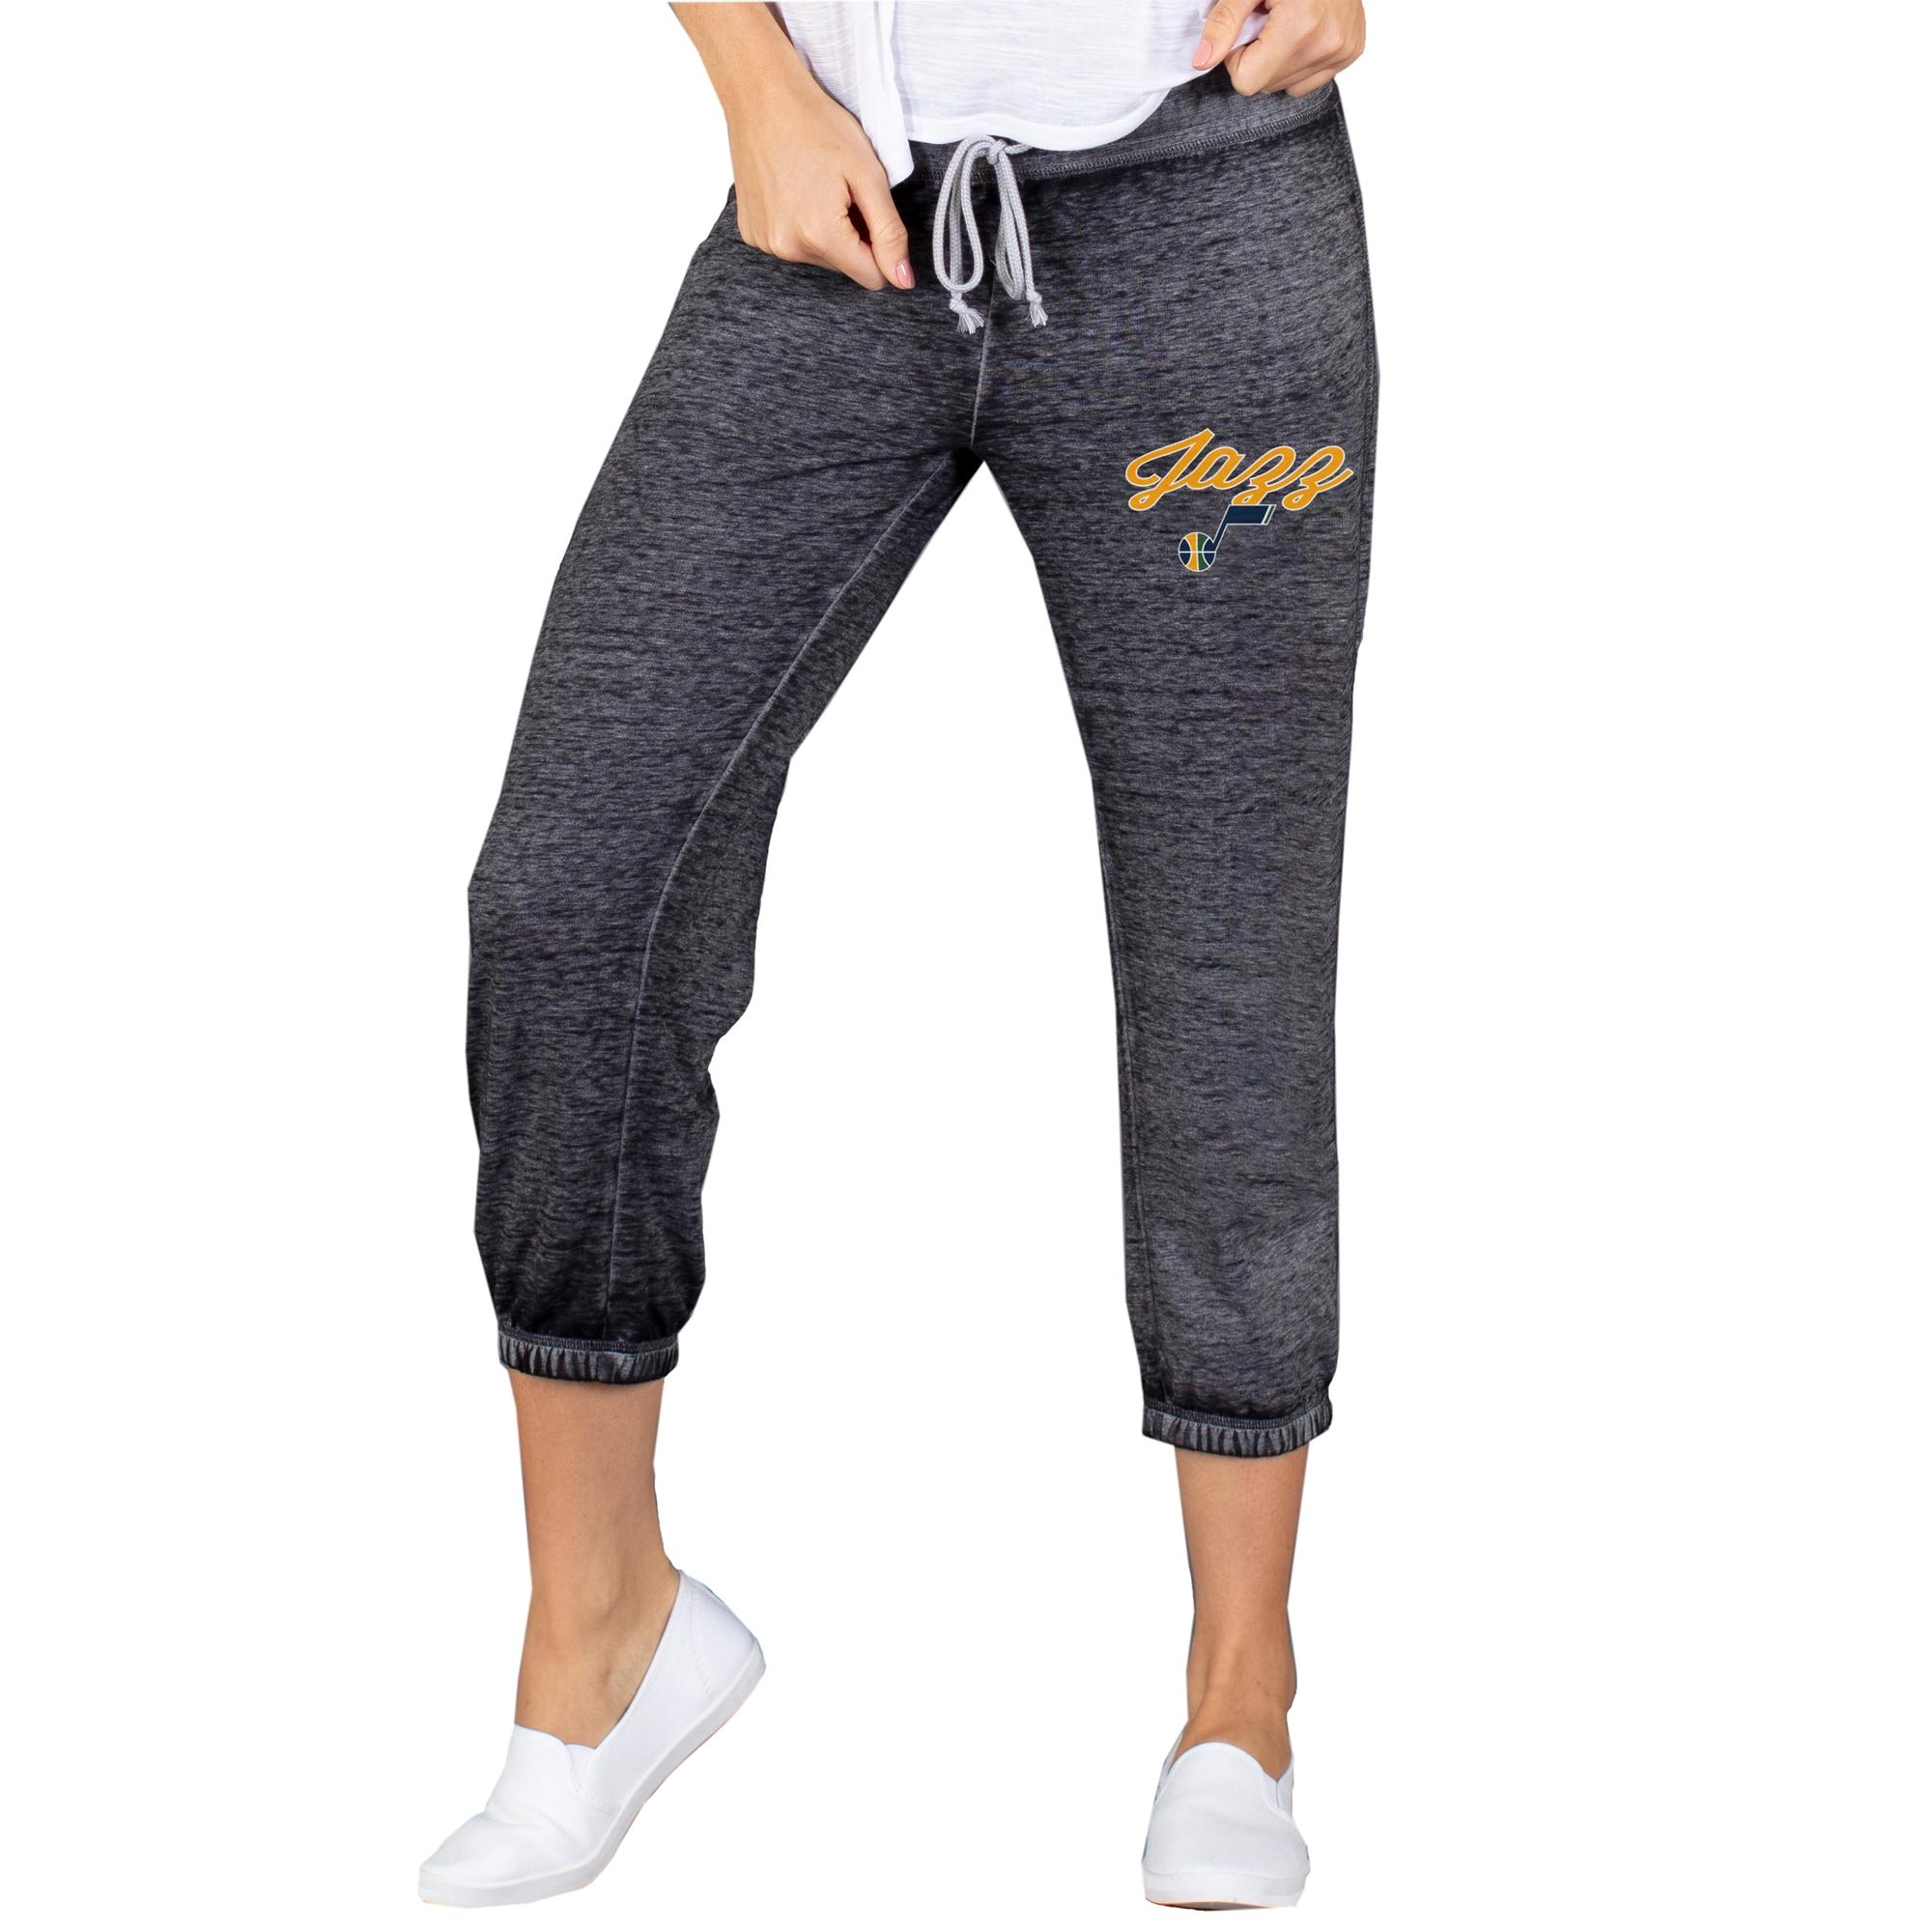 Utah Jazz Concepts Sport Women's Capri Knit Lounge Pants - Charcoal